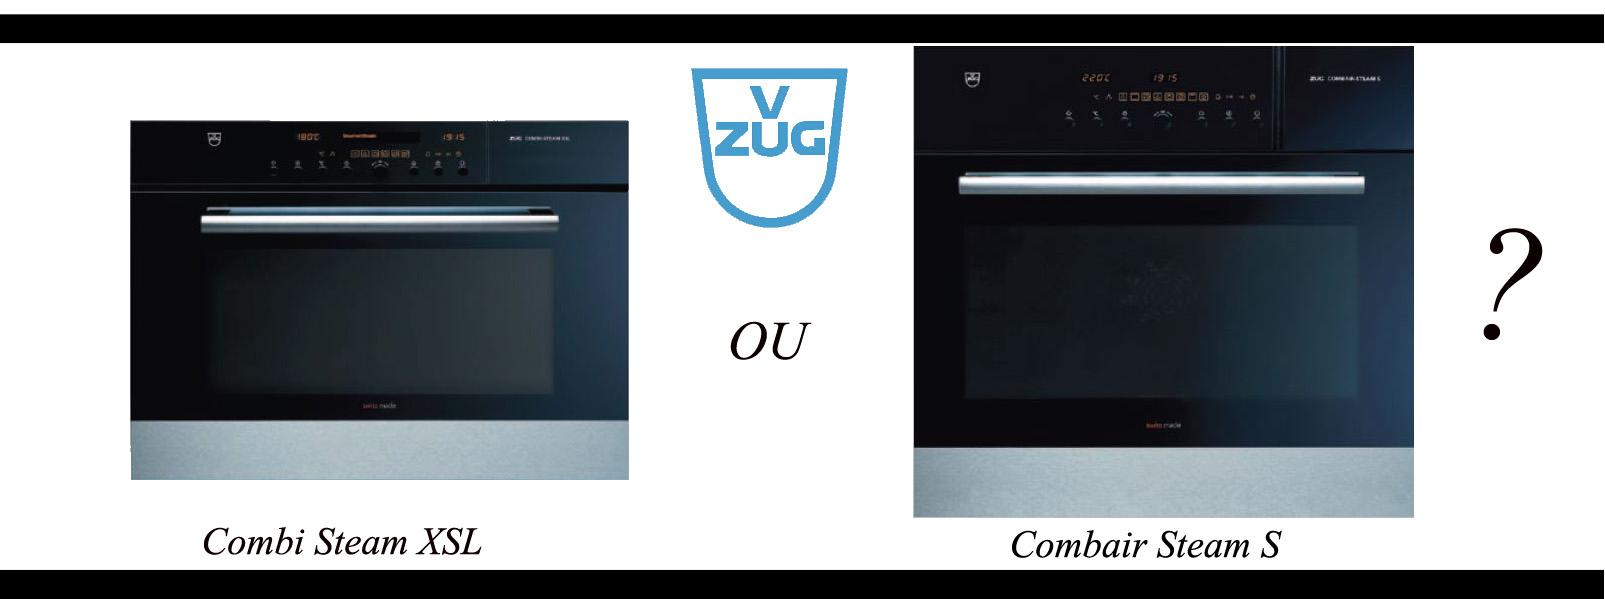 Jlm diffusion expert lectrom nager v zug combair steam s ou combi steam xsl - Prix four vapeur v zug ...